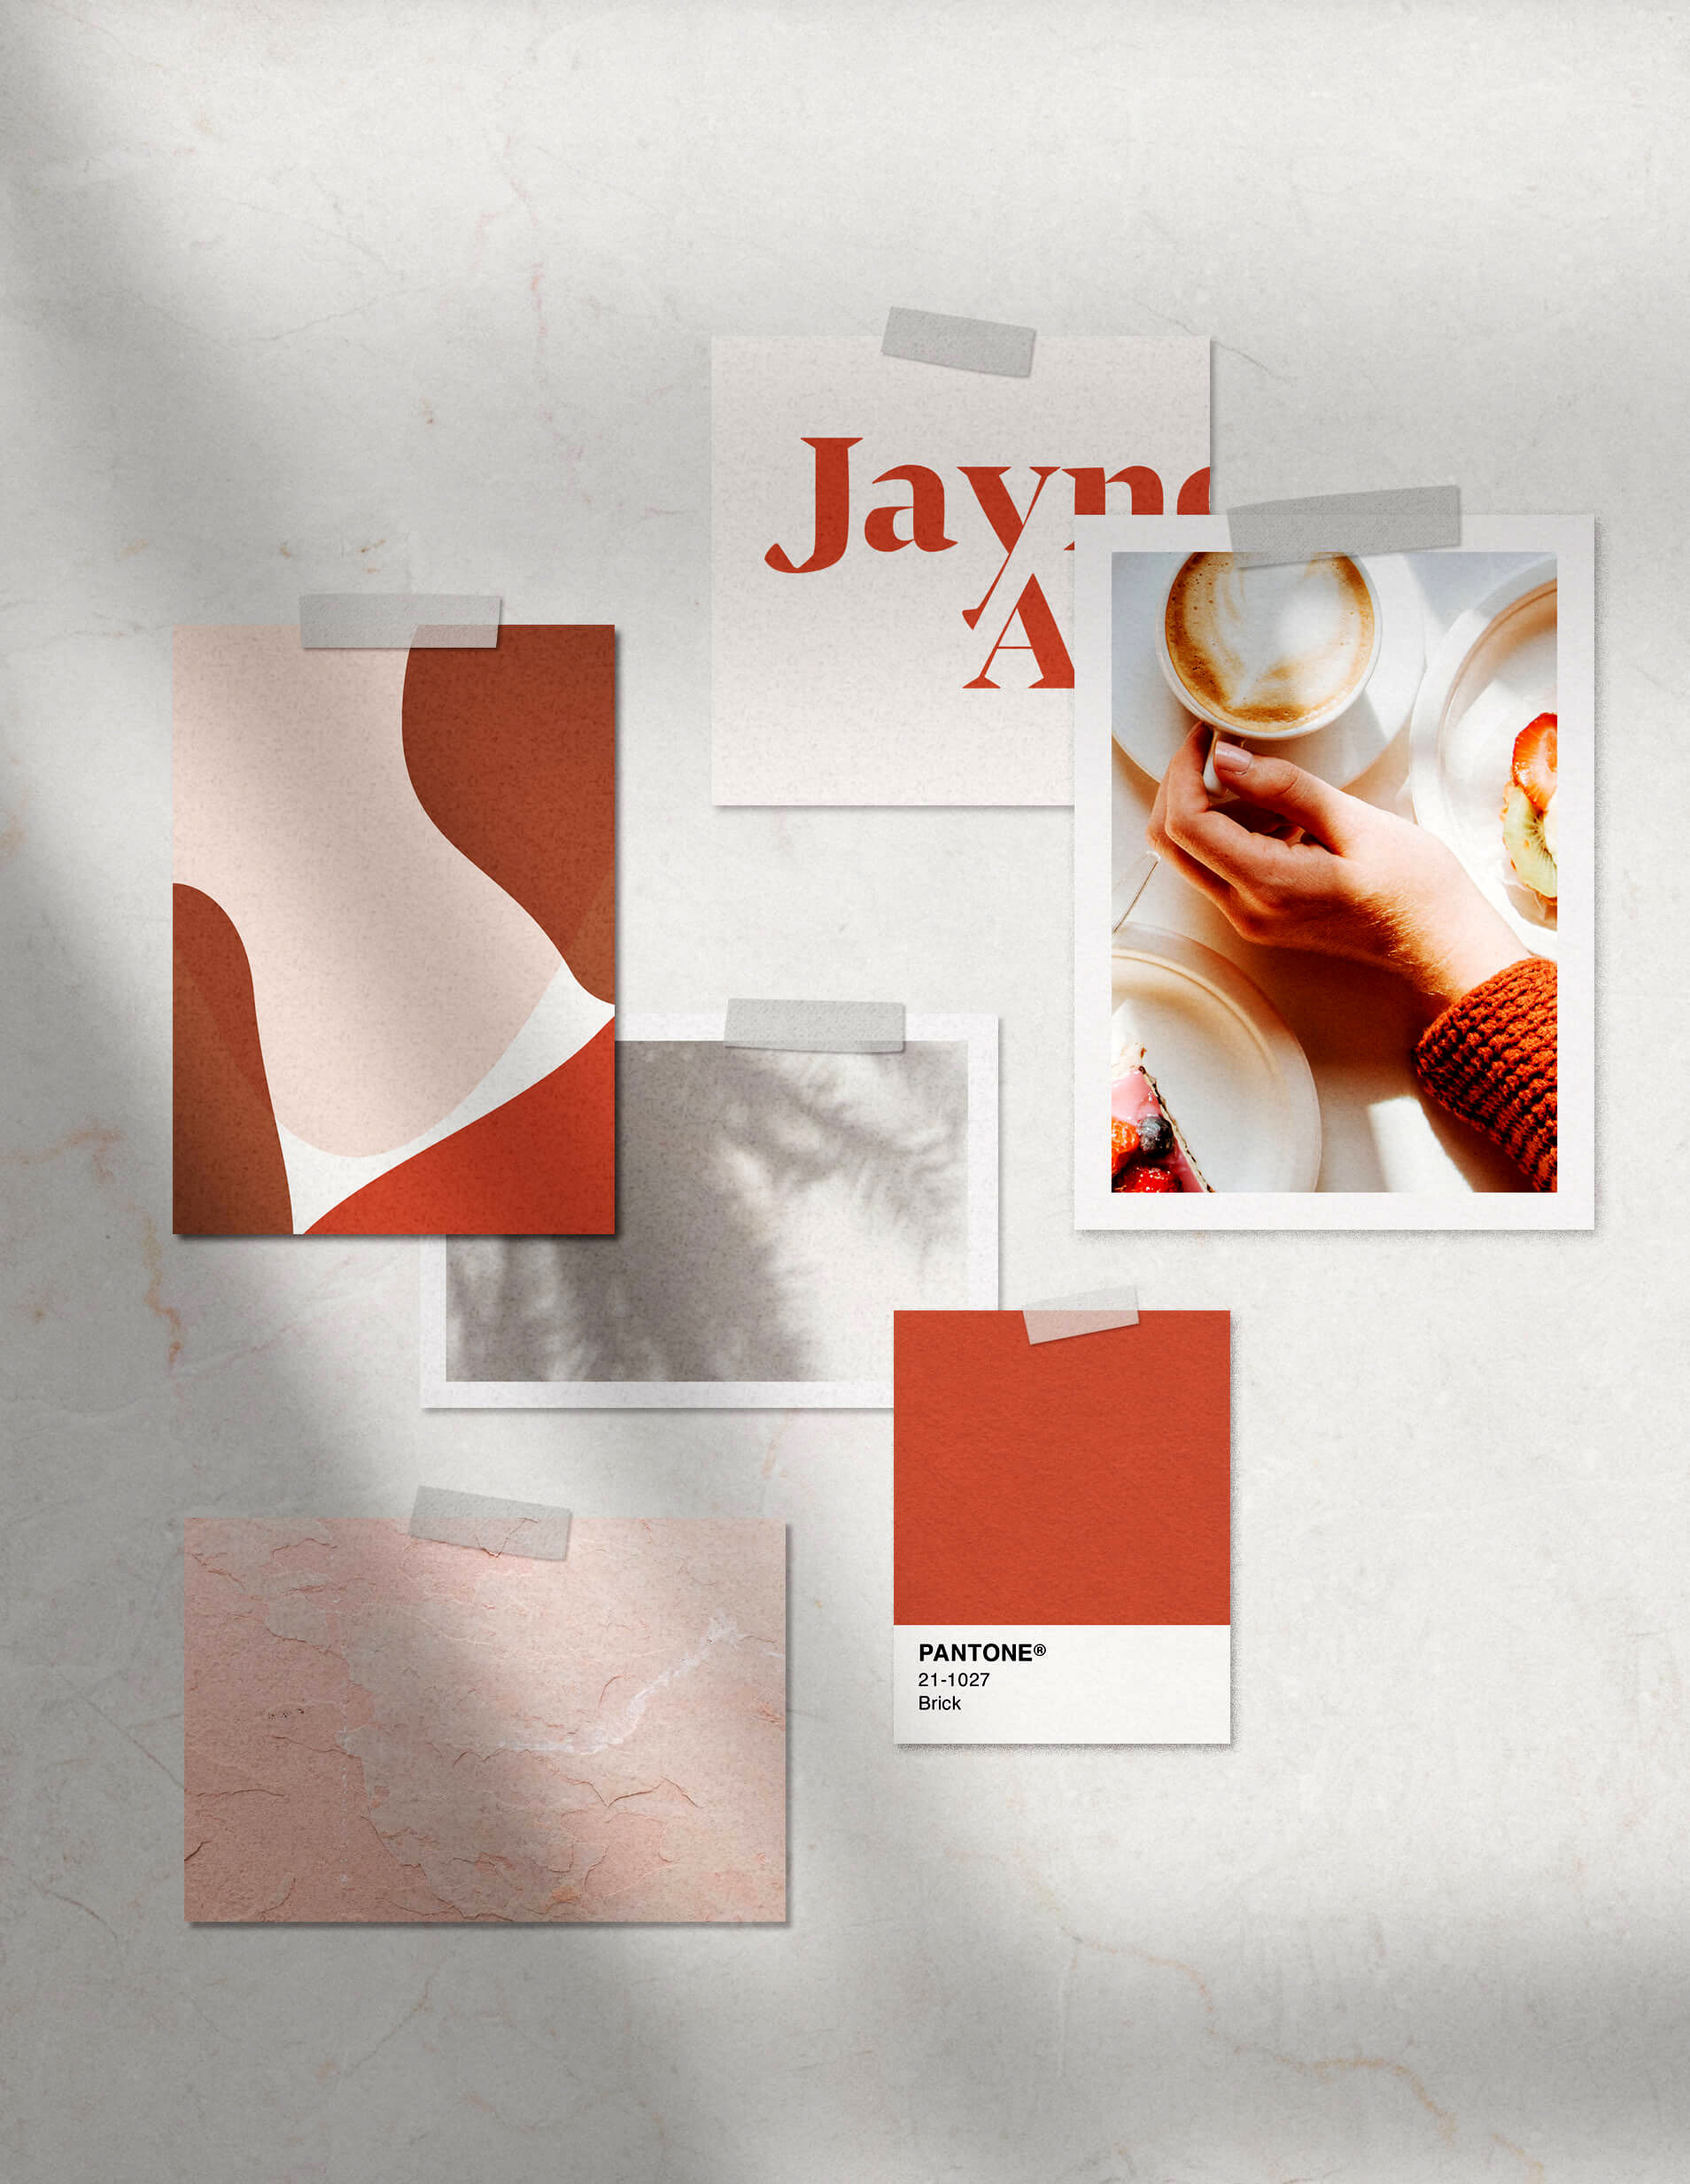 CUSTOMIZABLE Pre-Made Brand Kits for Creative Entrepreneurs, Stylish and Chic Social Media Templates, Saffron Avenue, www.saffronavenue.com